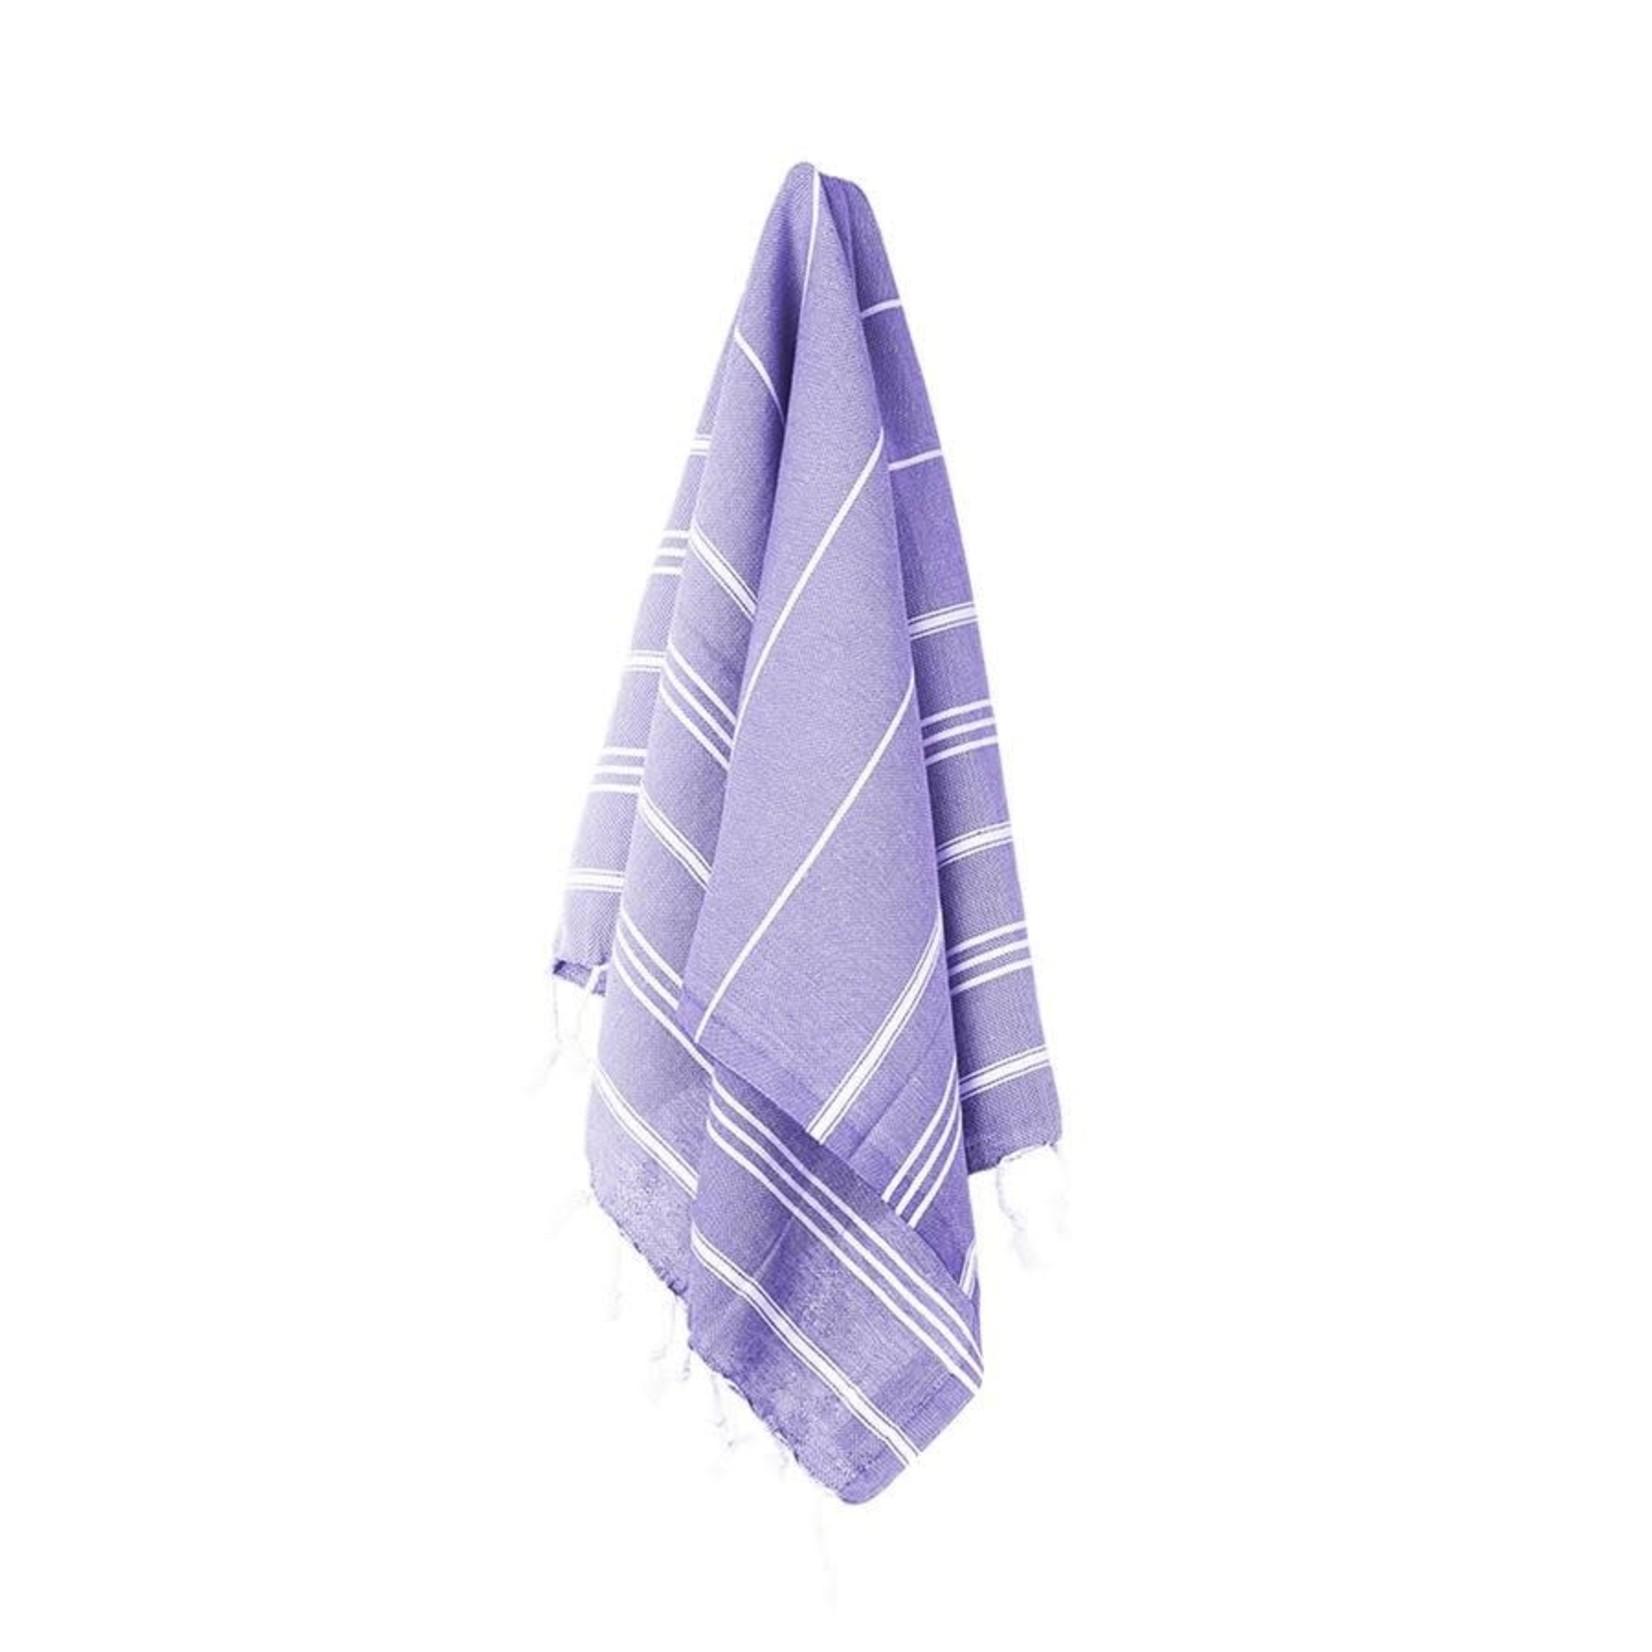 MARIN SMALL TOWEL - ROYAL PURPLE